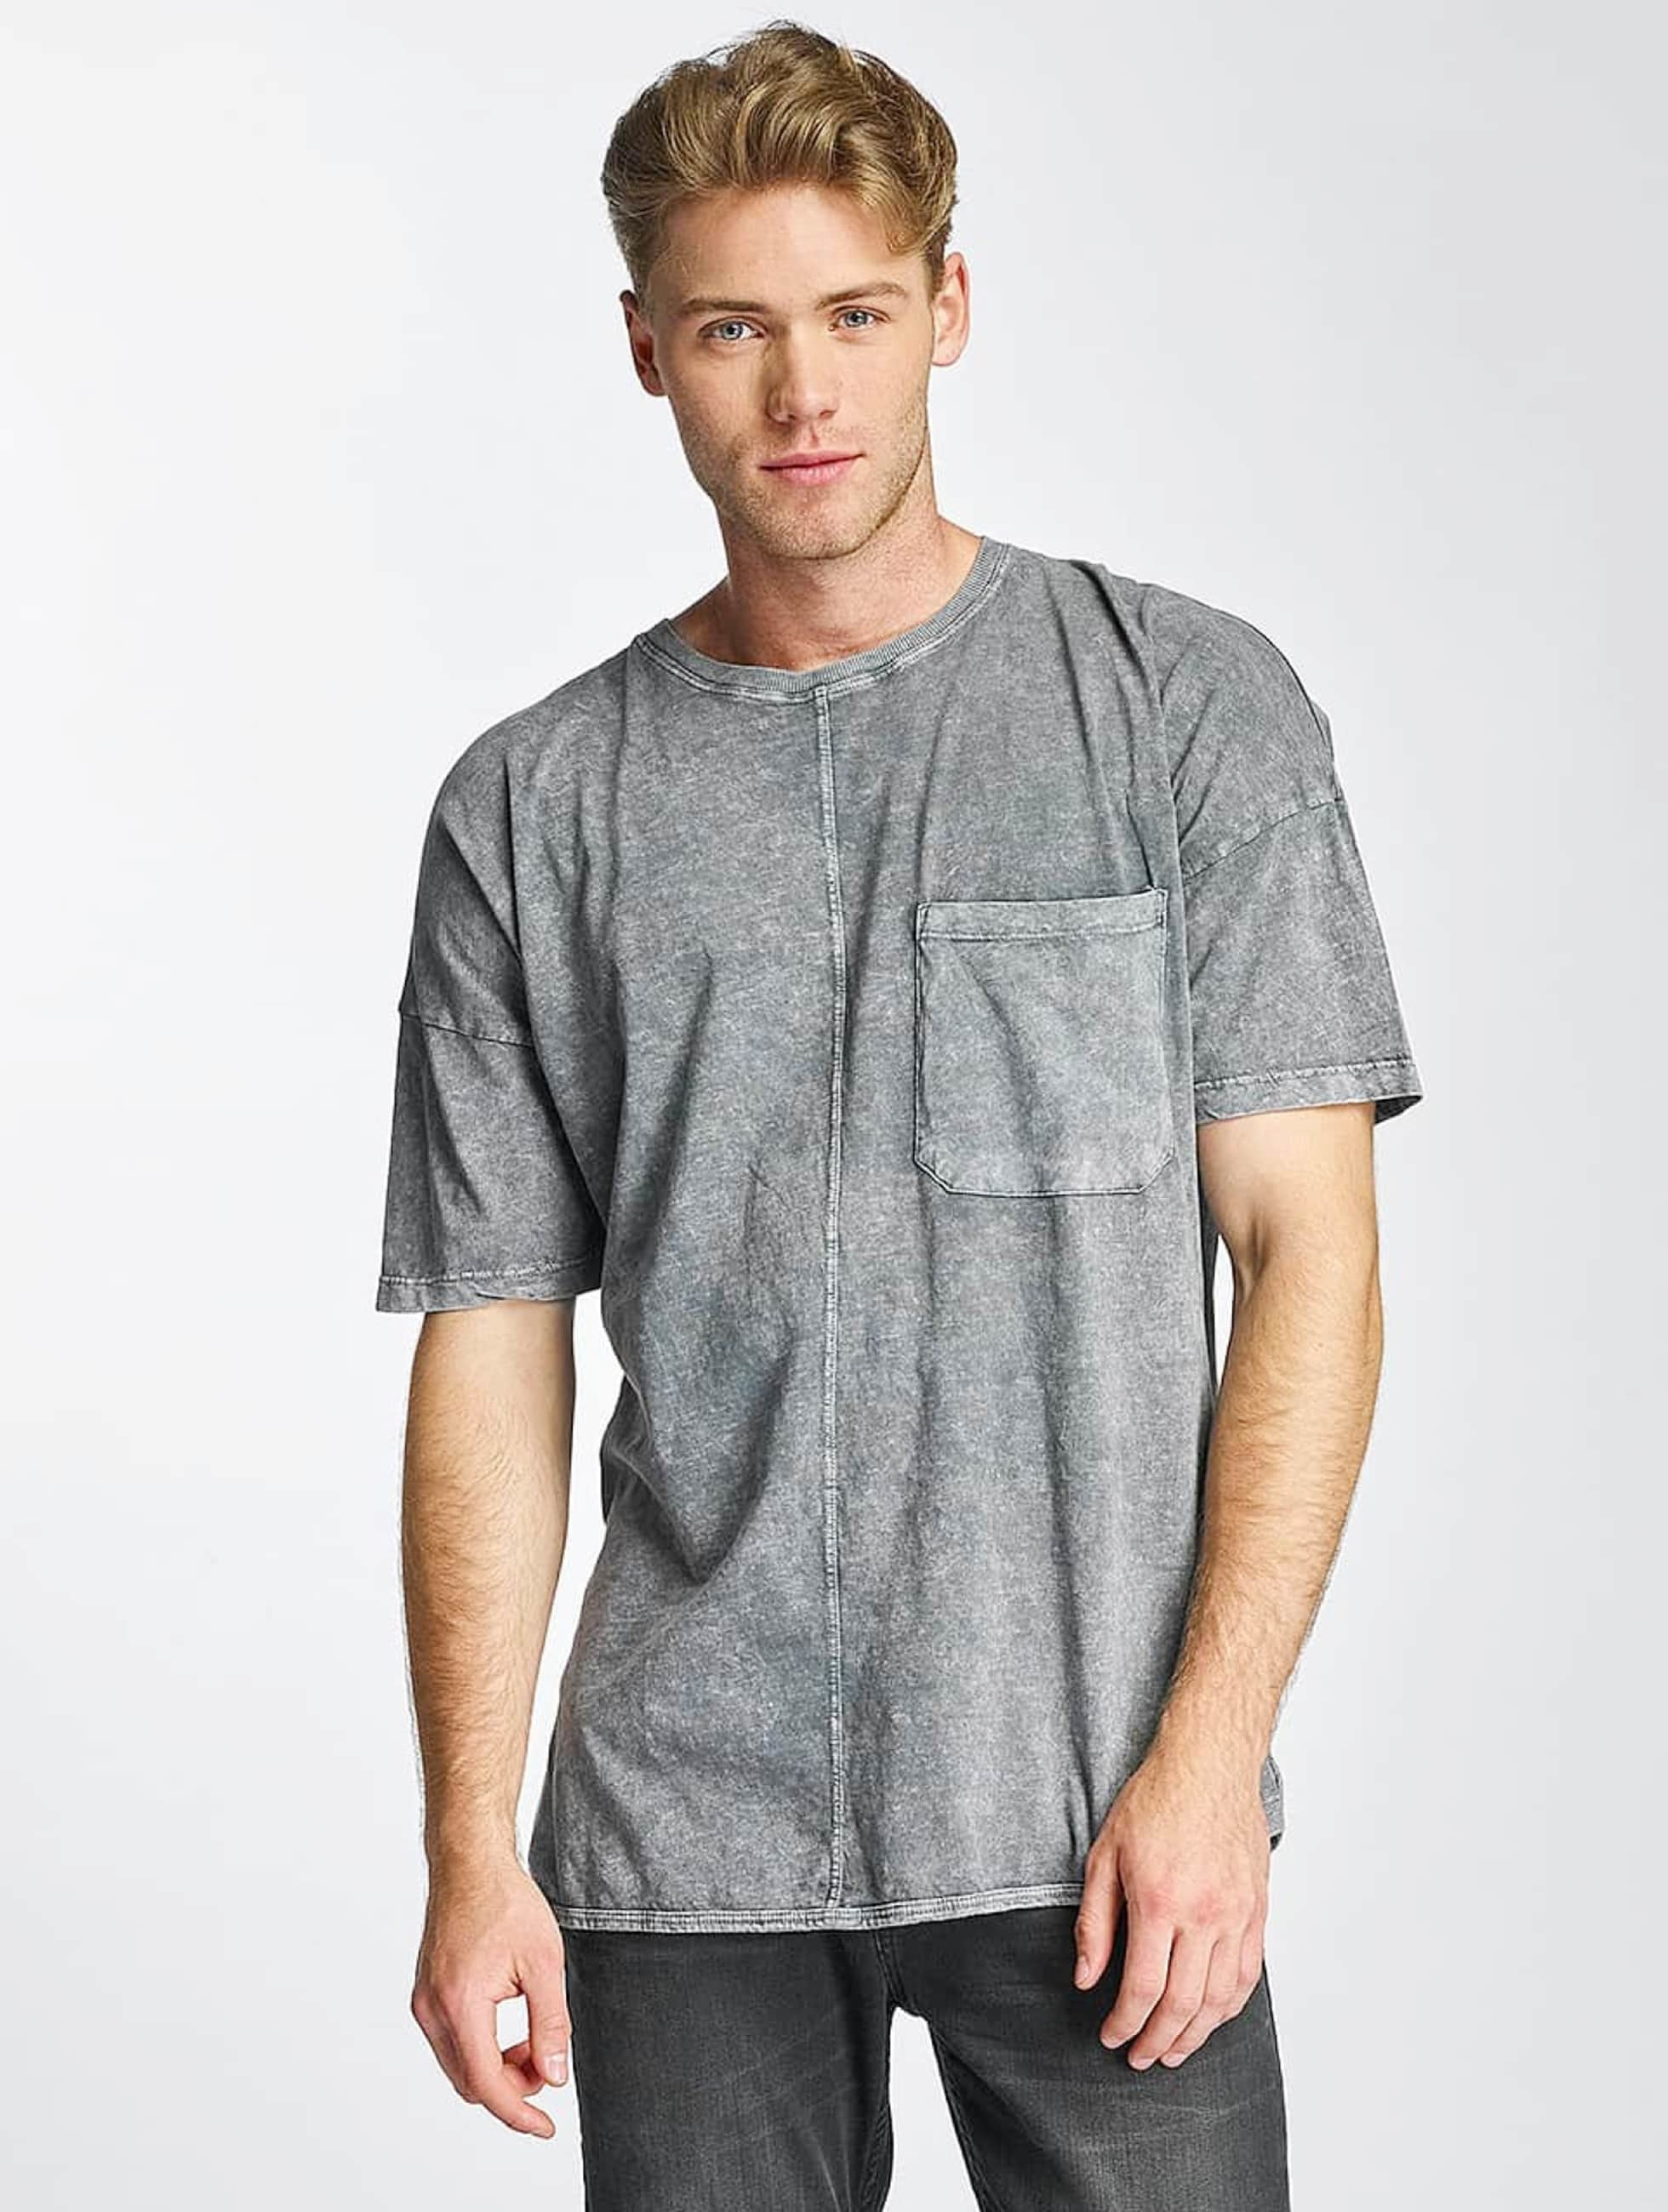 Bangastic-Uomini-Maglieria-T-shirt-Zeus